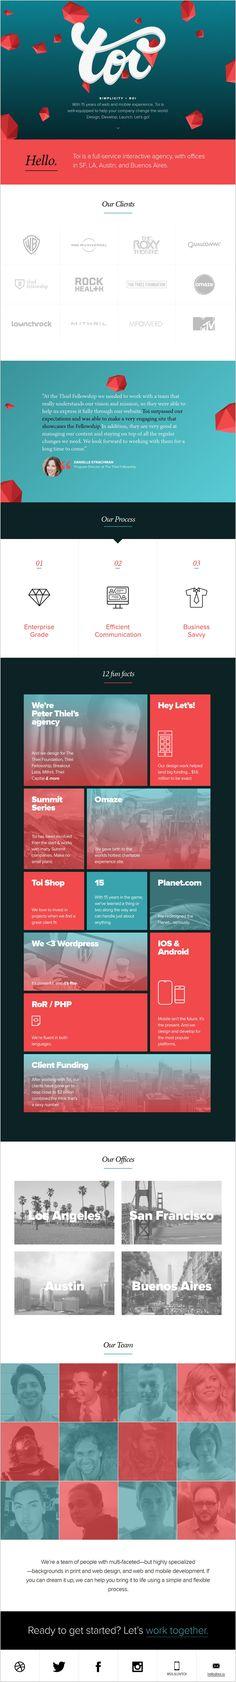 Daily Web Design And Development Inspirations No.513